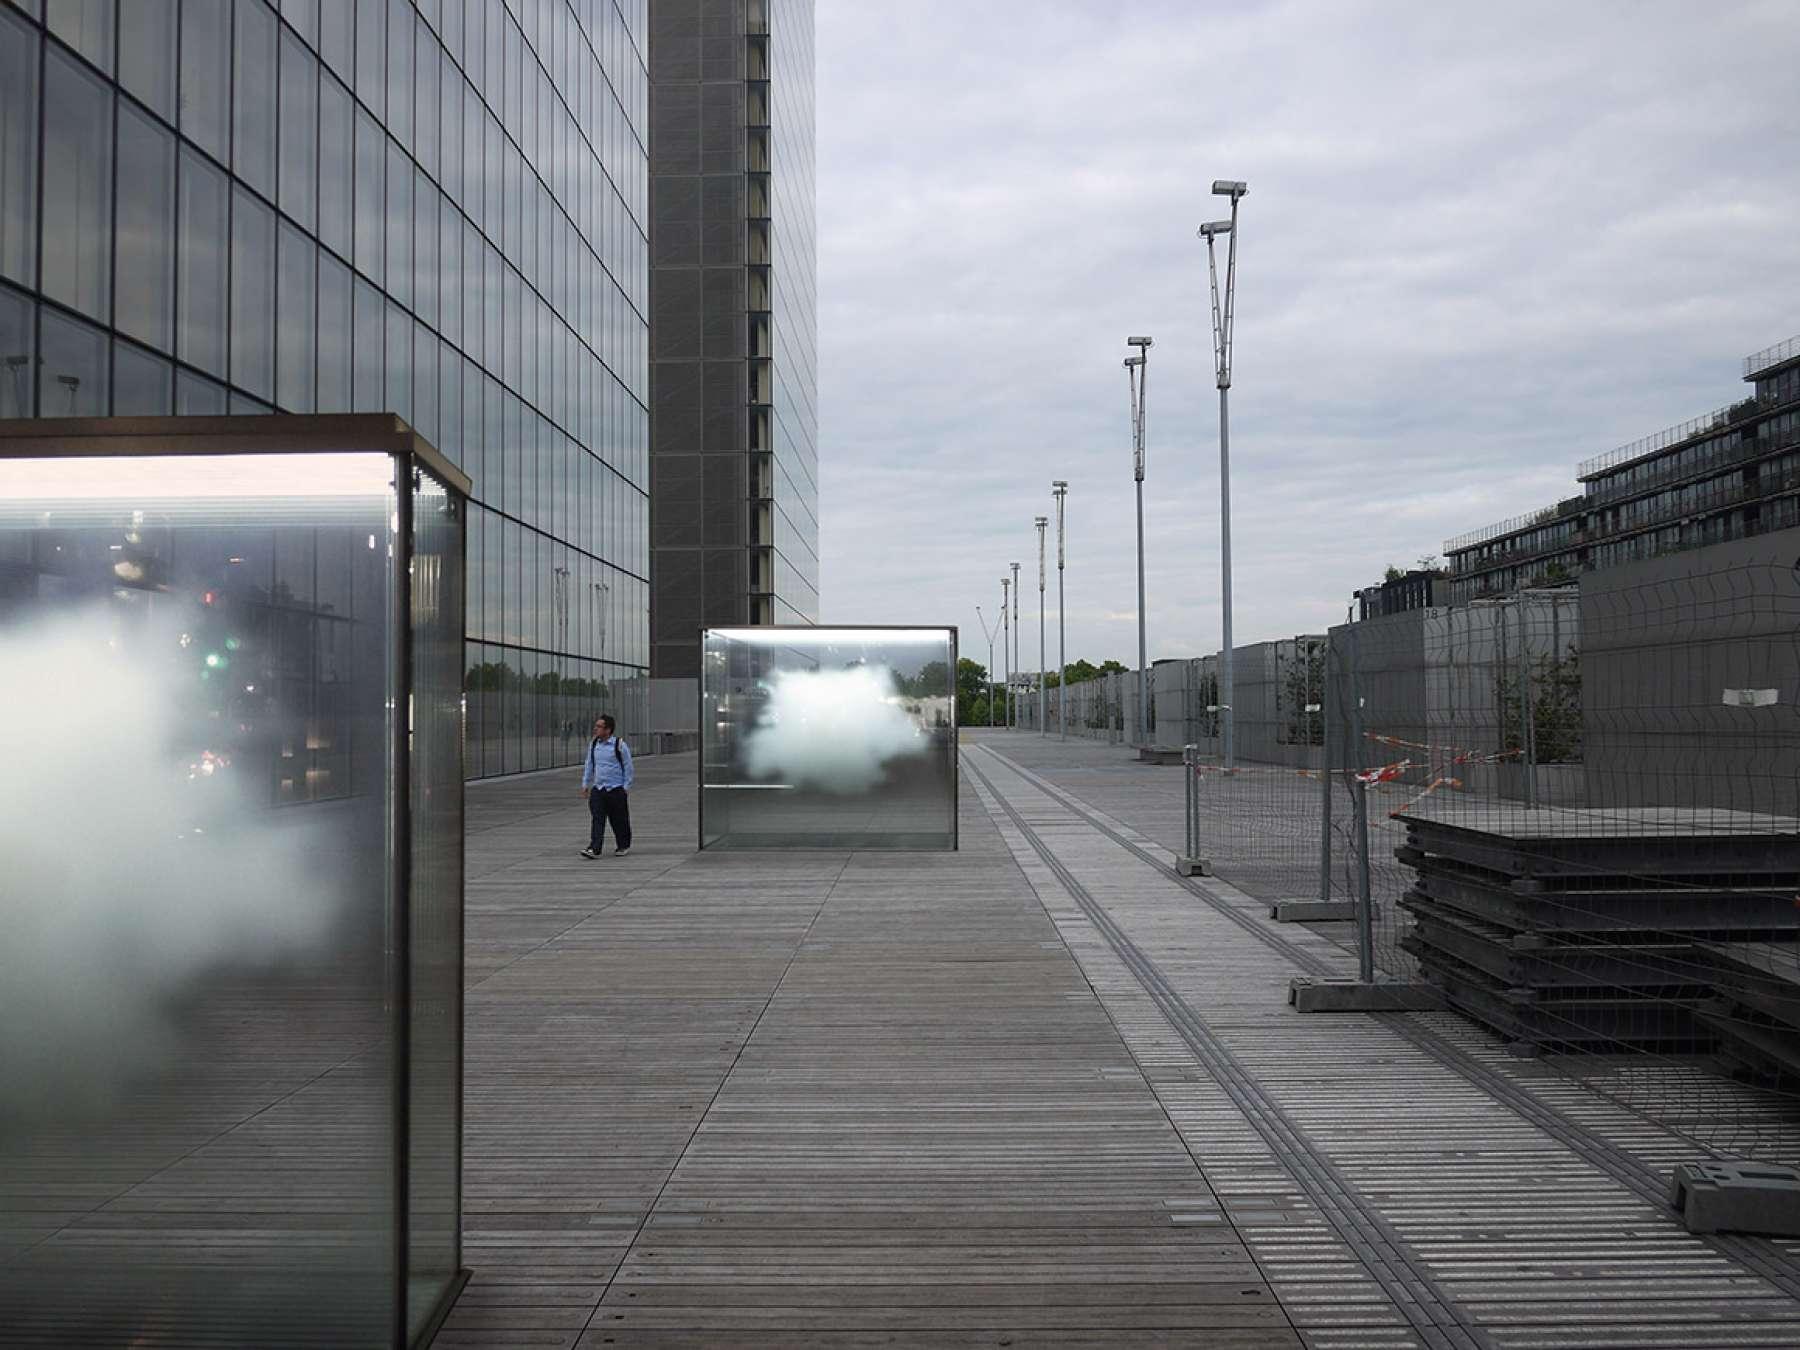 Particules elementaires Architecte Leandro Erlich